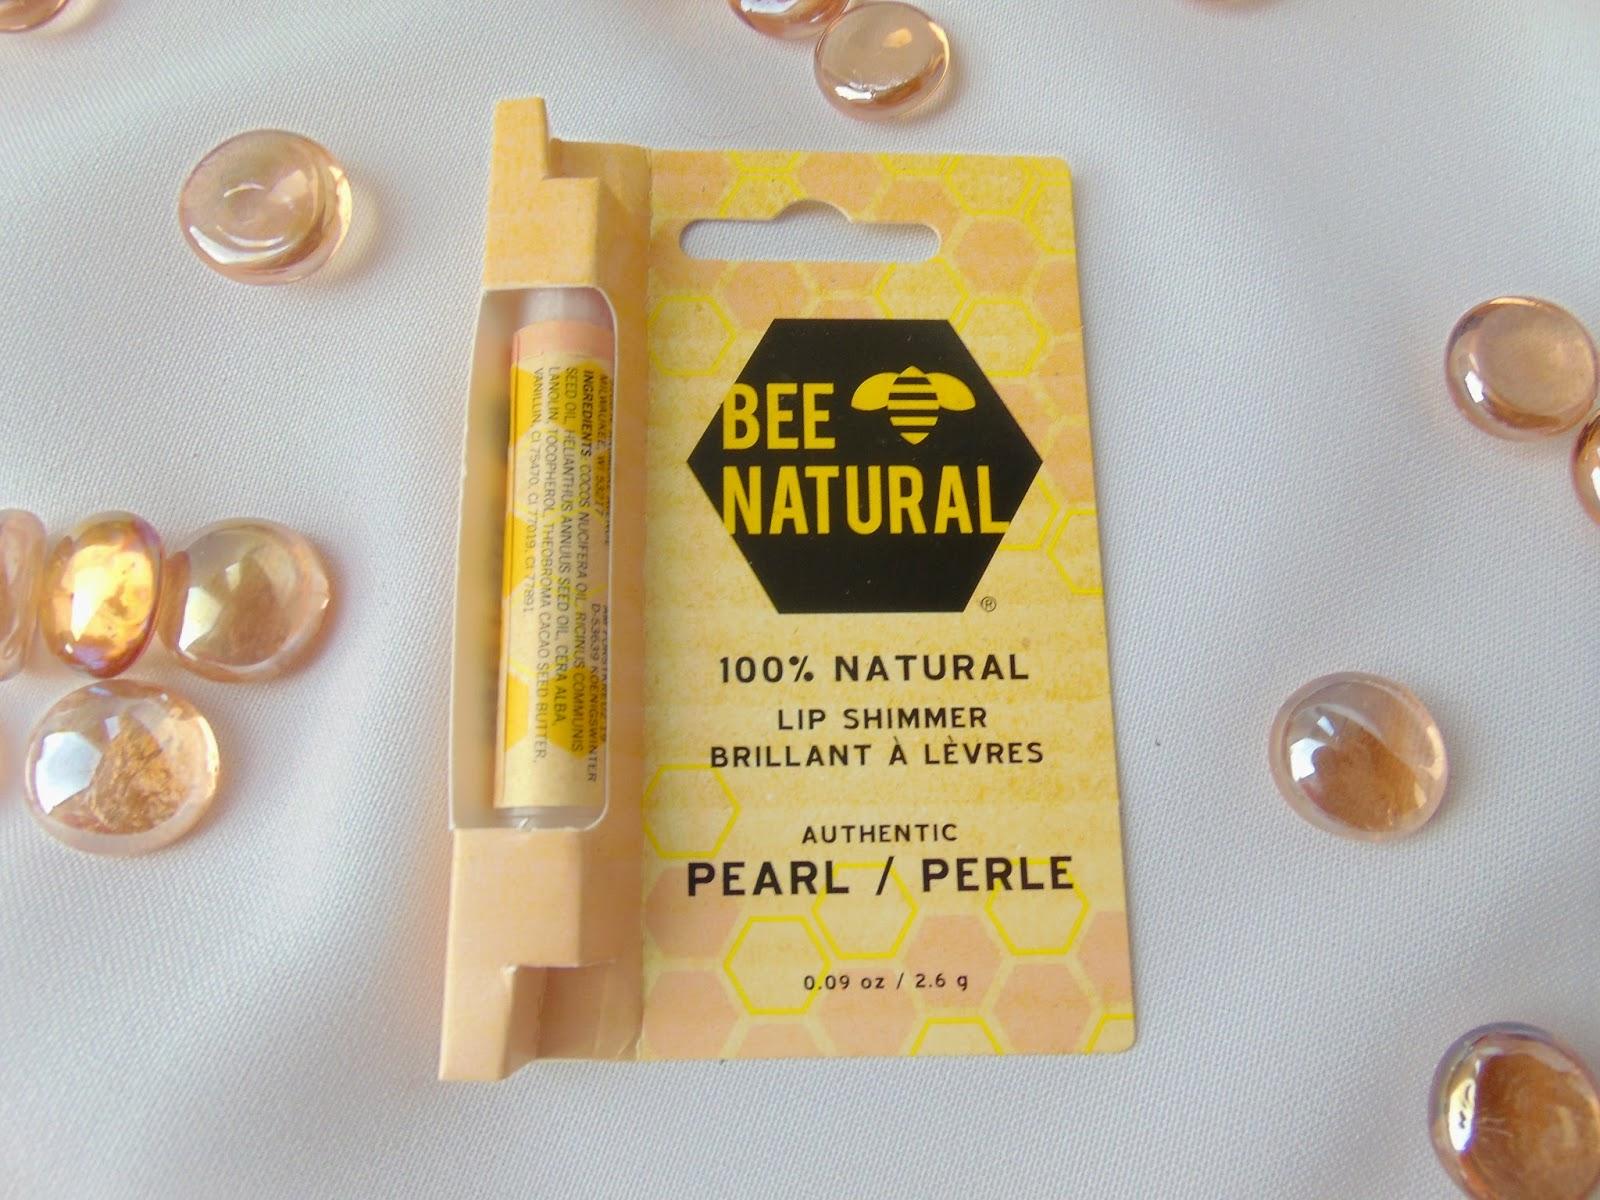 Lippenbalsam - Bee Natural - Pearl - www.annitschkasblog.de